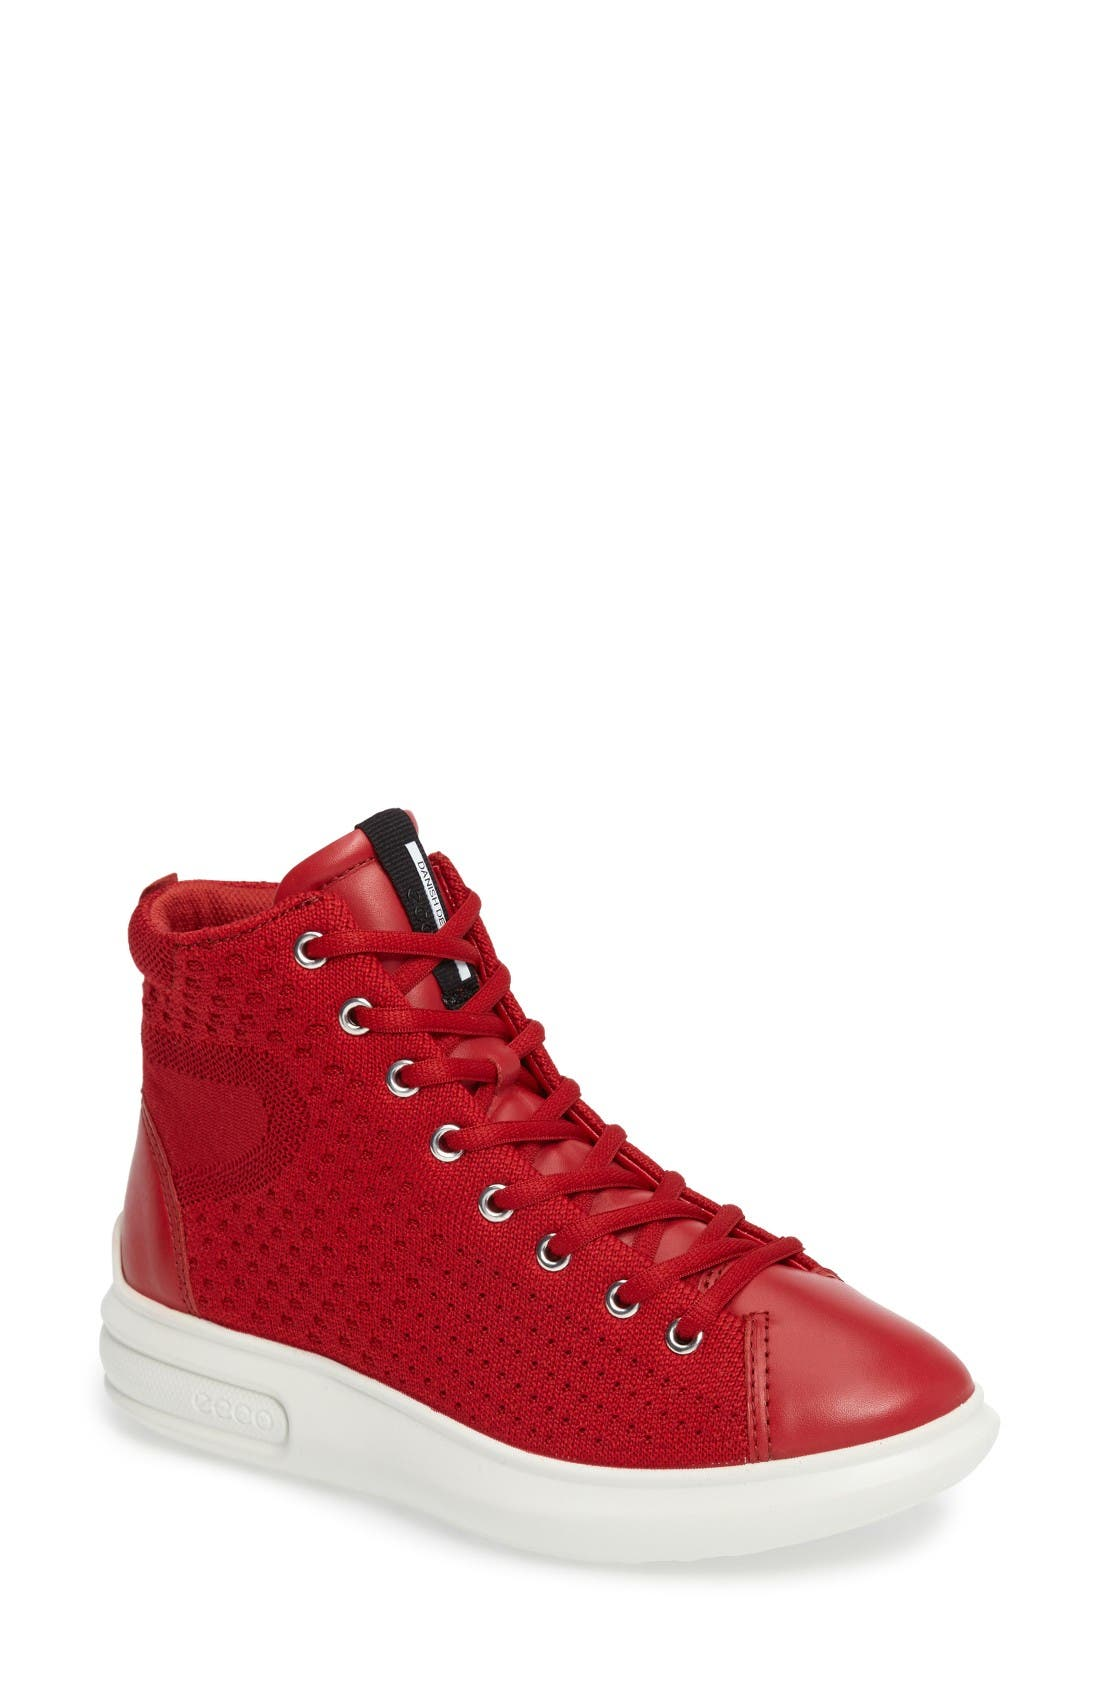 ECCO Soft 3 High Top Sneaker (Women)